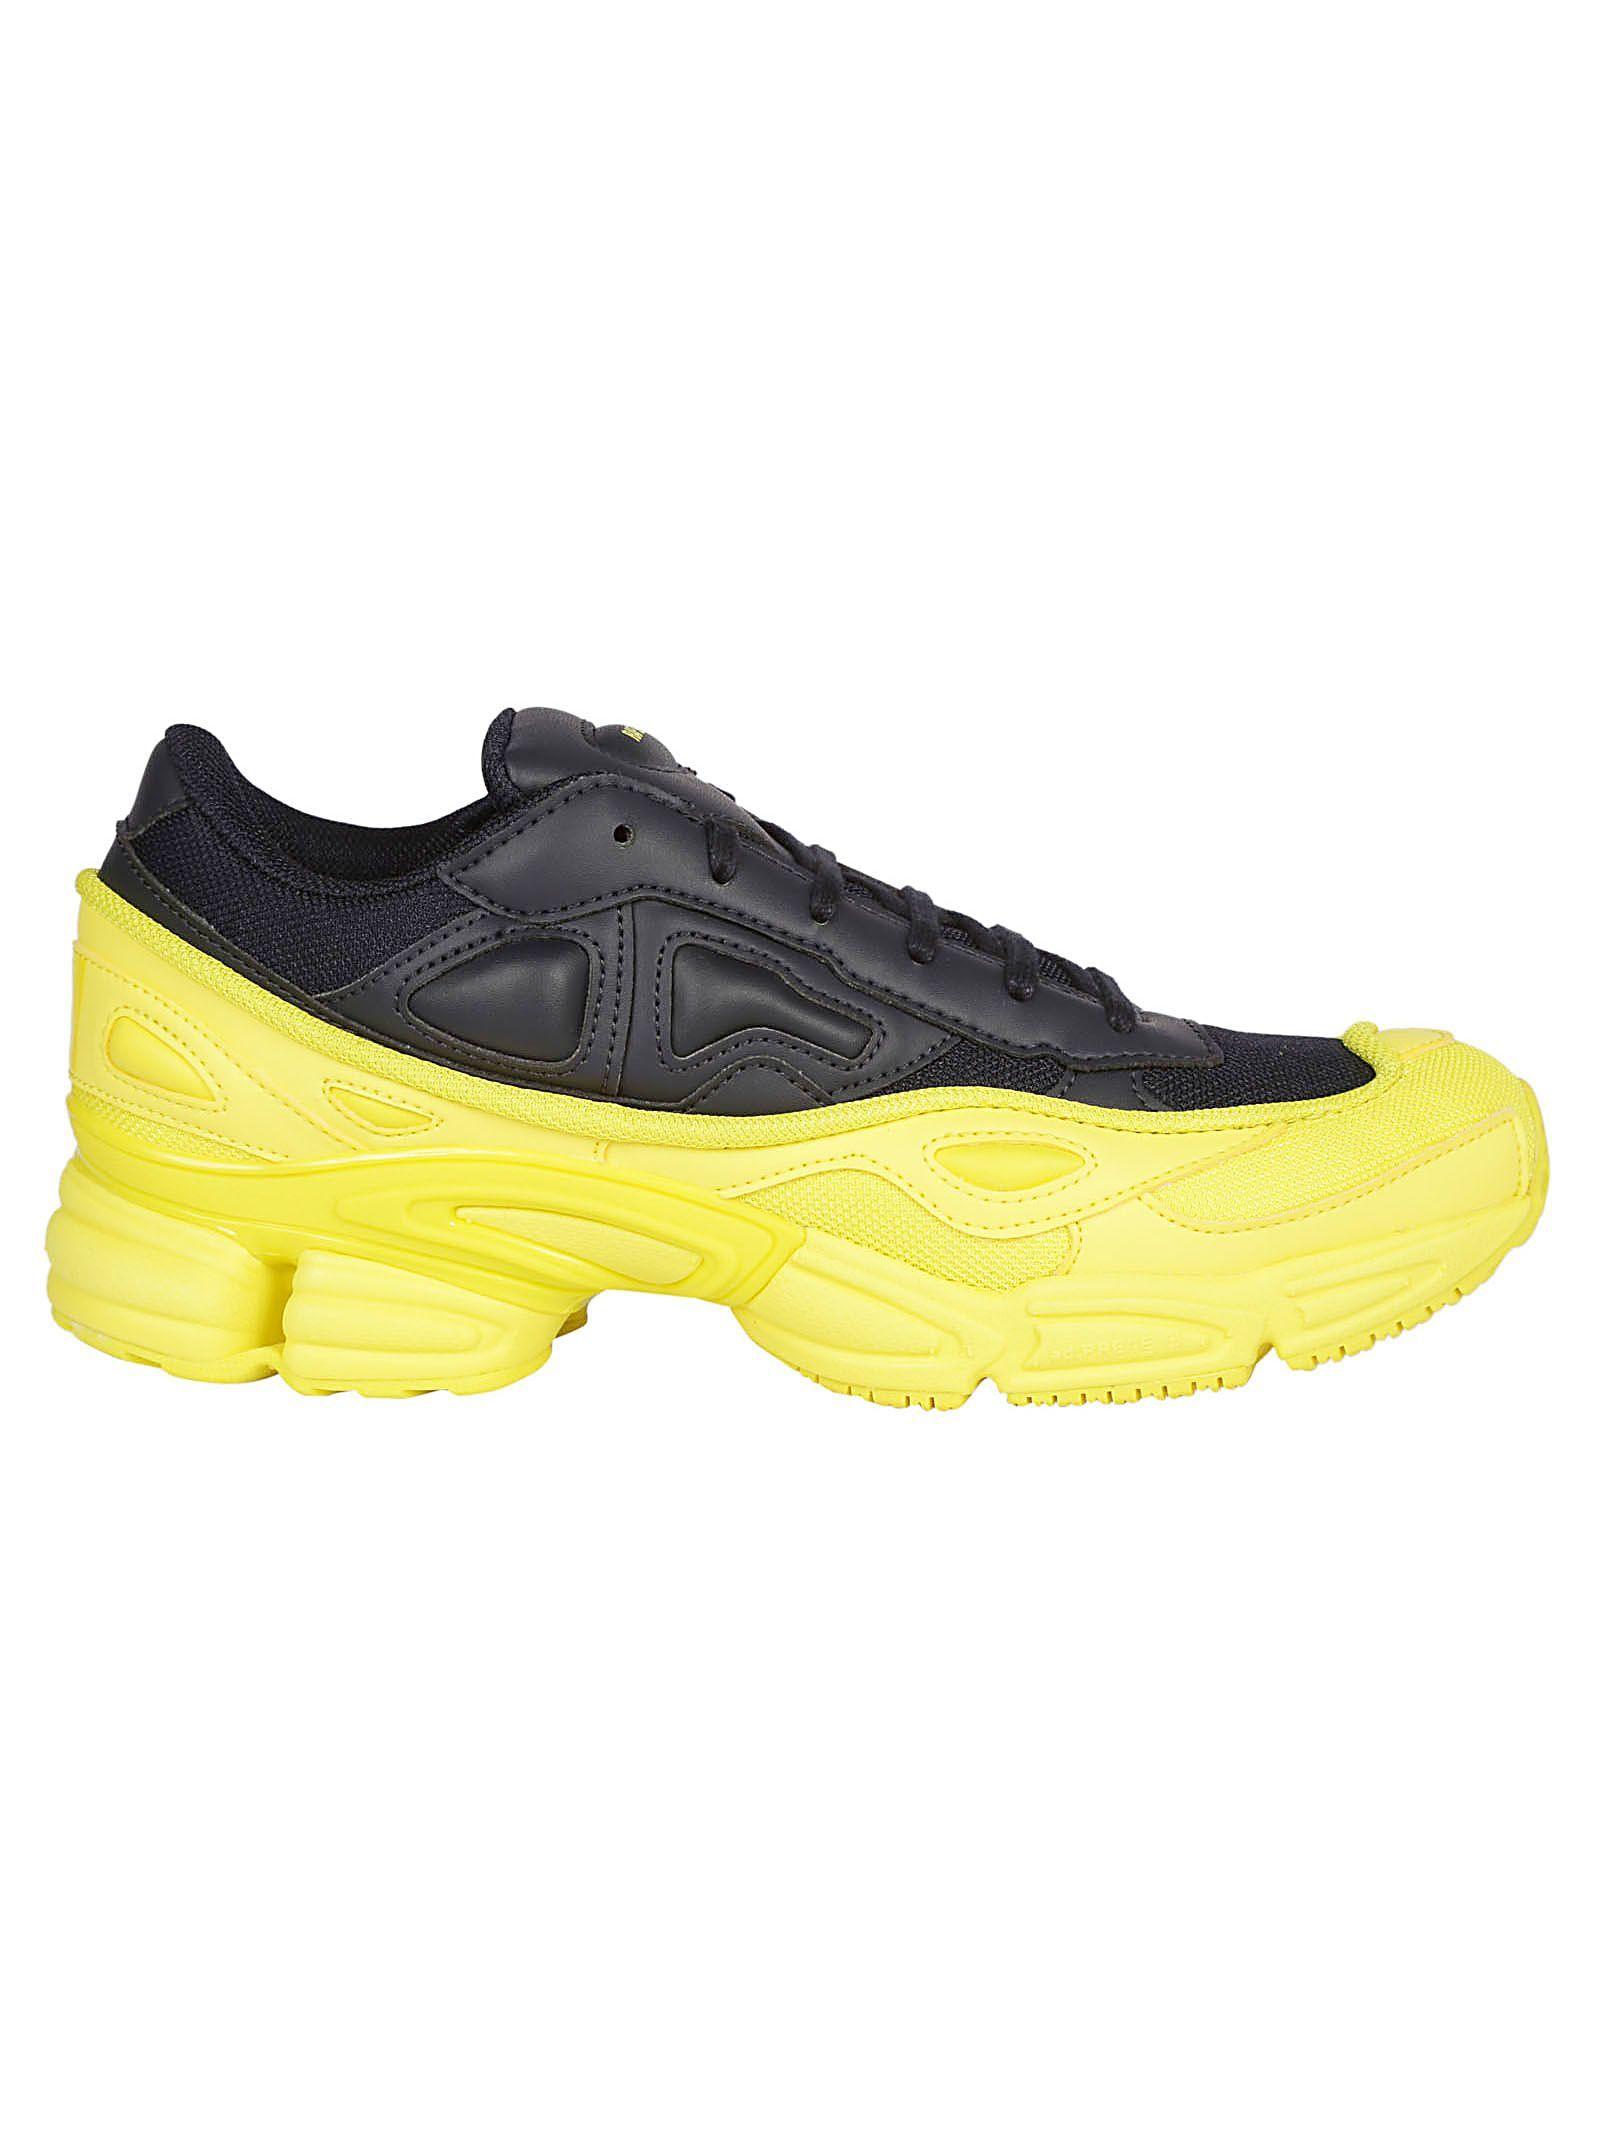 df88ba744d13c ADIDAS BY RAF SIMONS RS OZWEEGO SNEAKERS.  adidasbyrafsimons  shoes ...